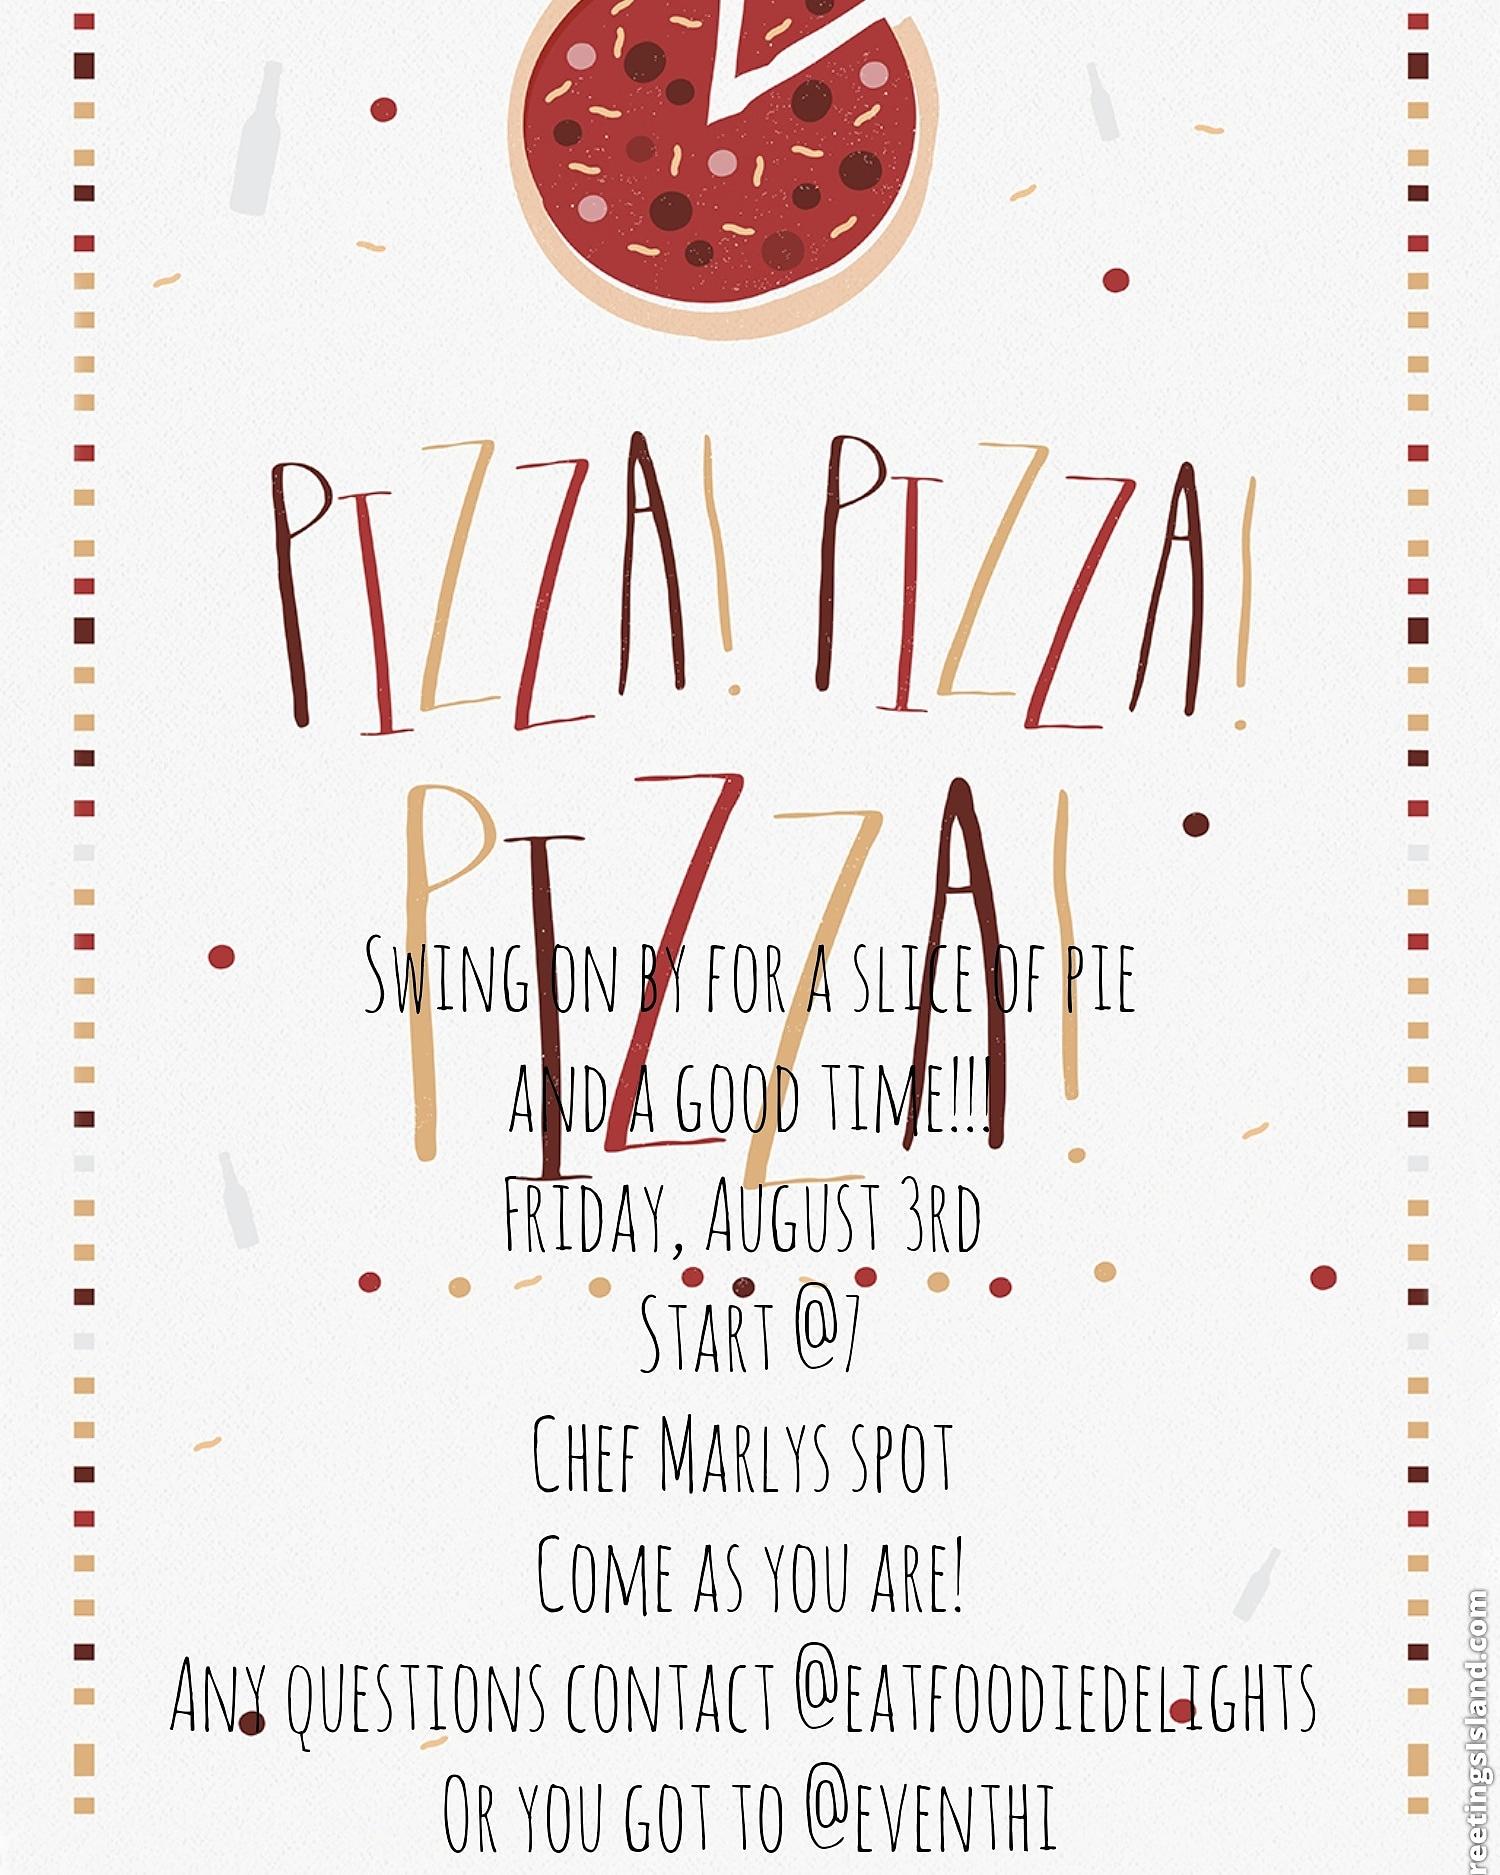 Pizza Night/Grown folks Friday